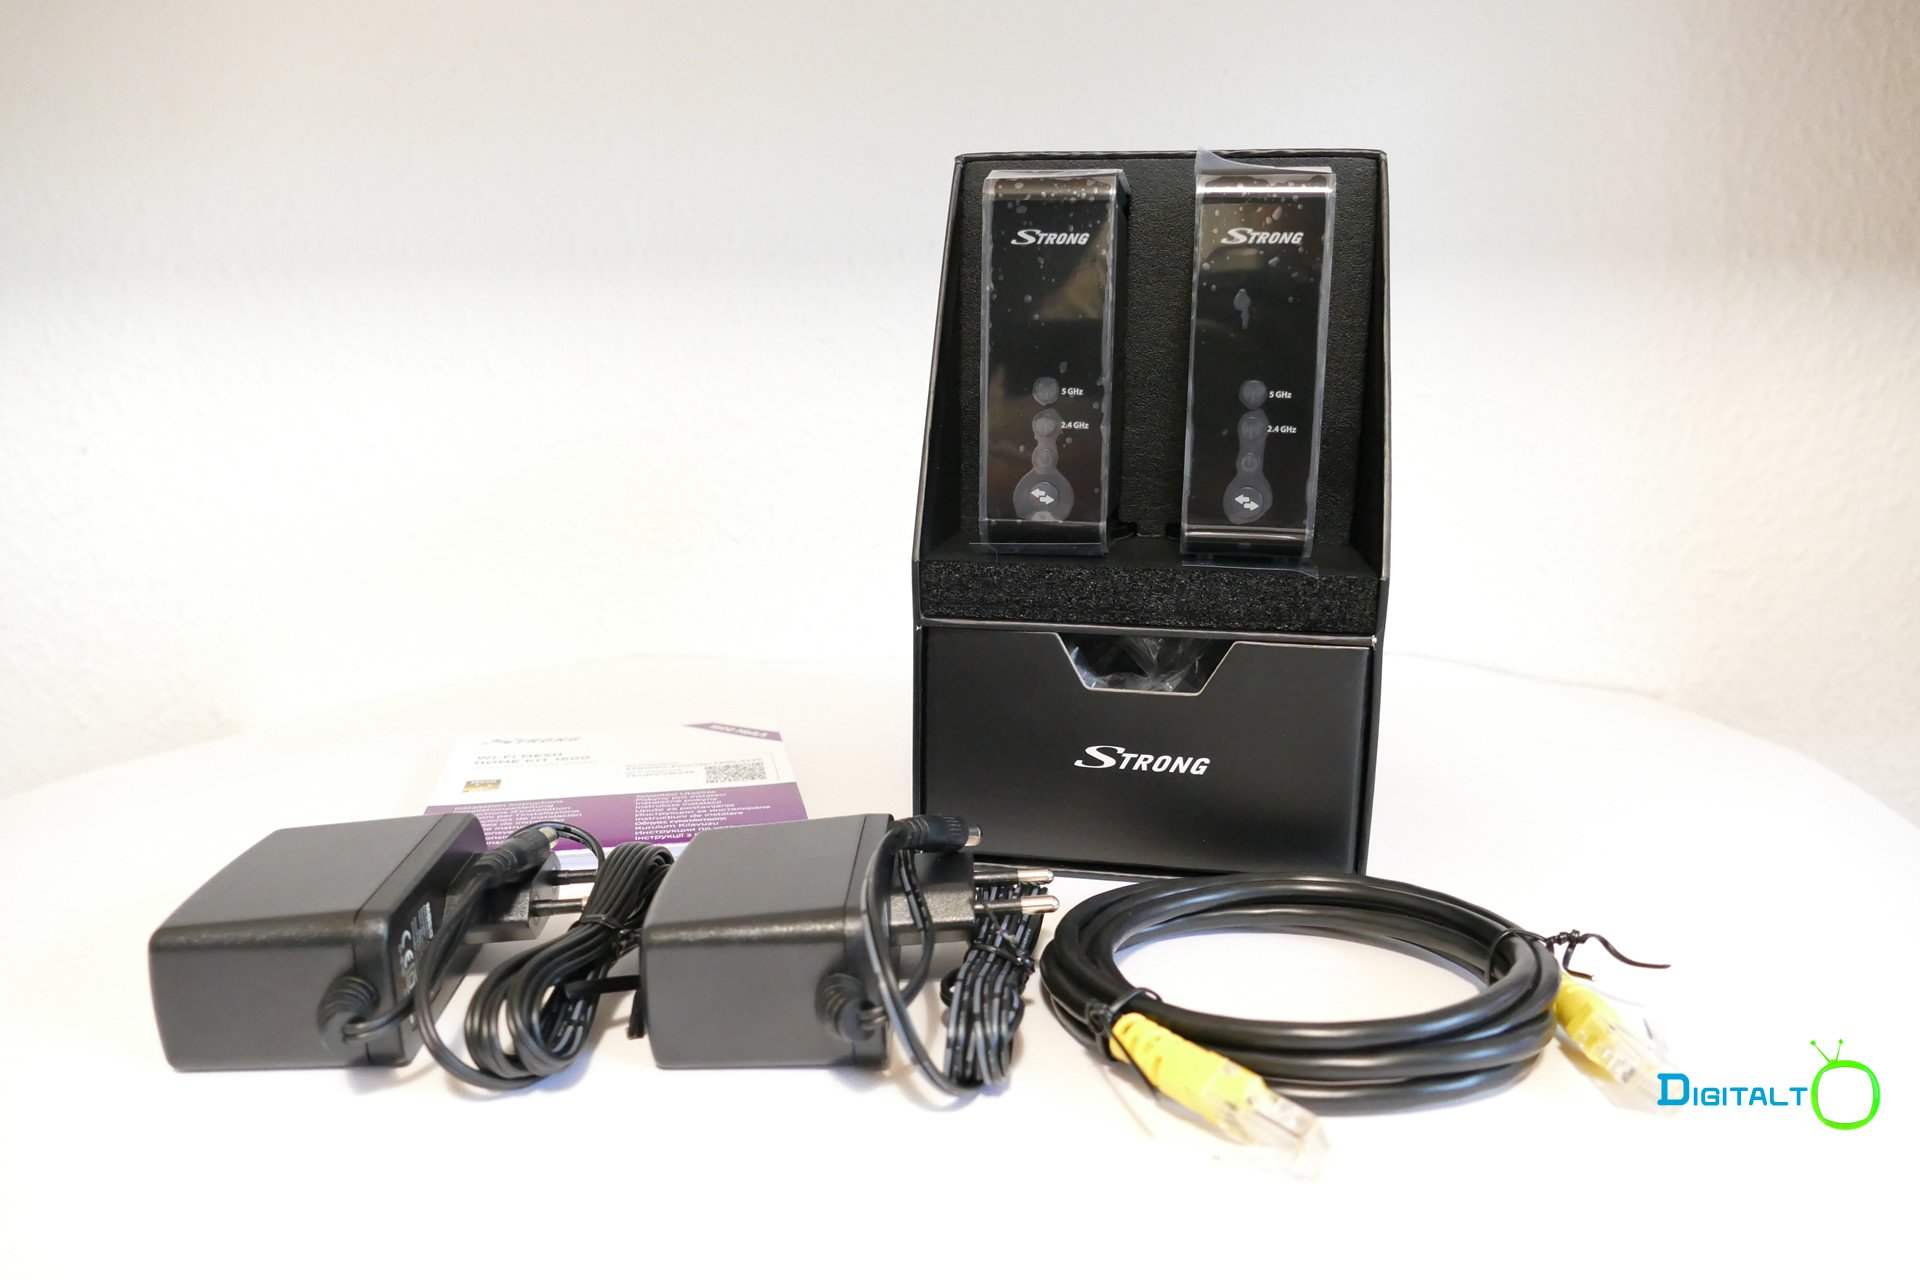 Strong Wi-Fi Mesh Kit 1600 udpakket